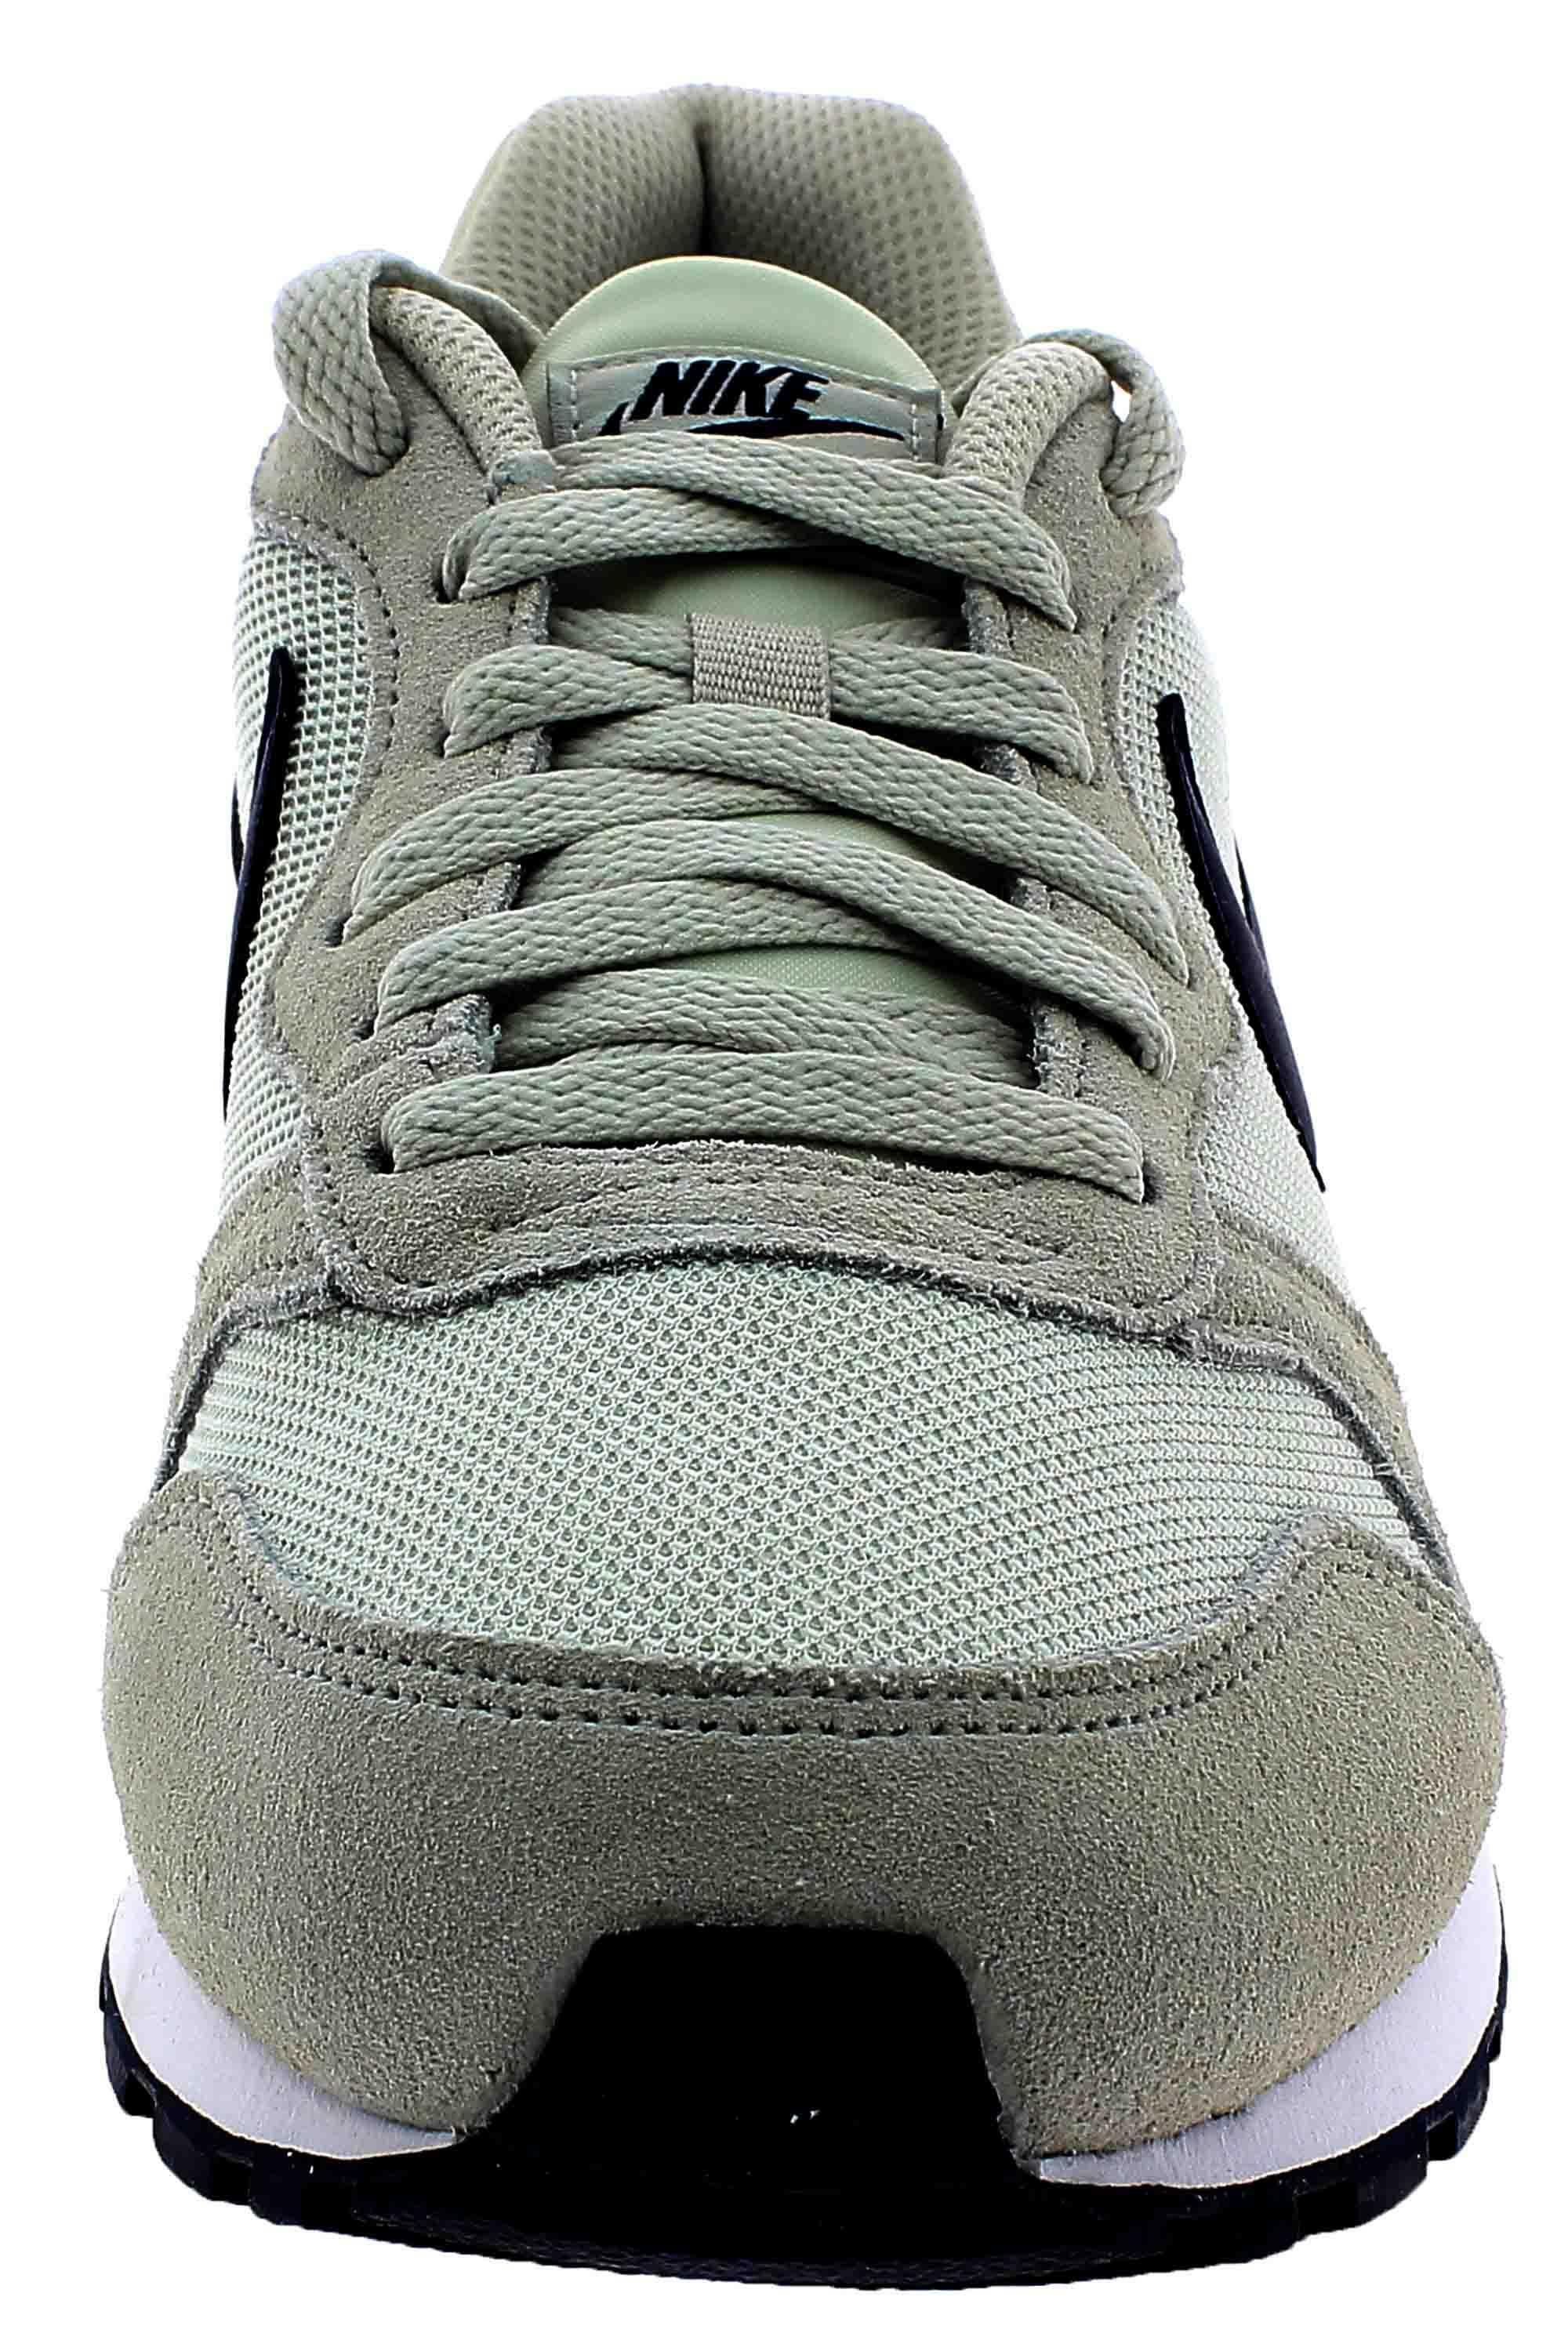 1b5a5f22eabe nike md runner 2 scarpe sportive uomo beige 749794009